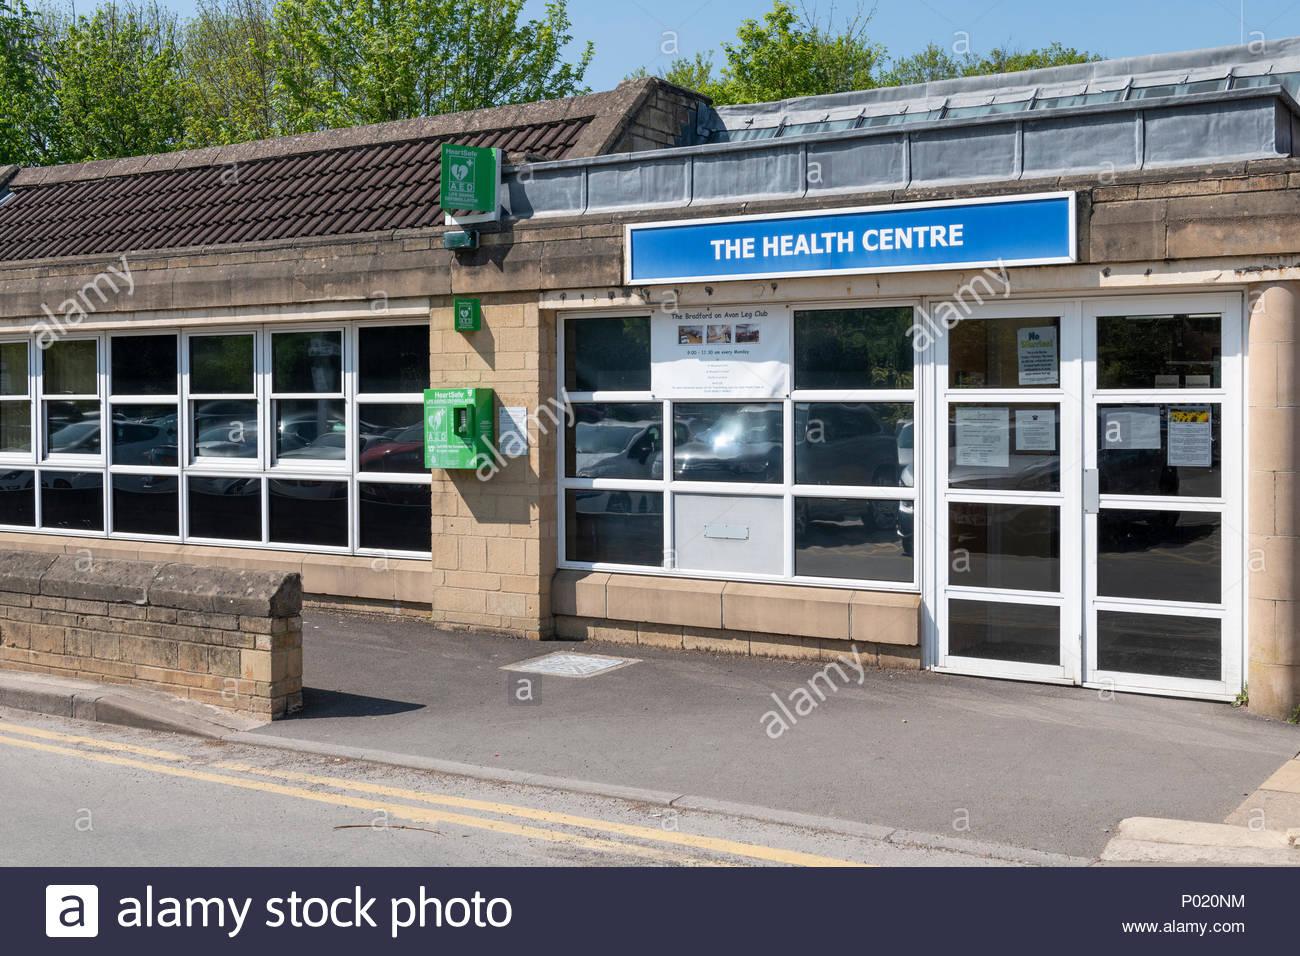 The health centre, Bradford on Avon, Wiltshire, England, UK - Stock Image